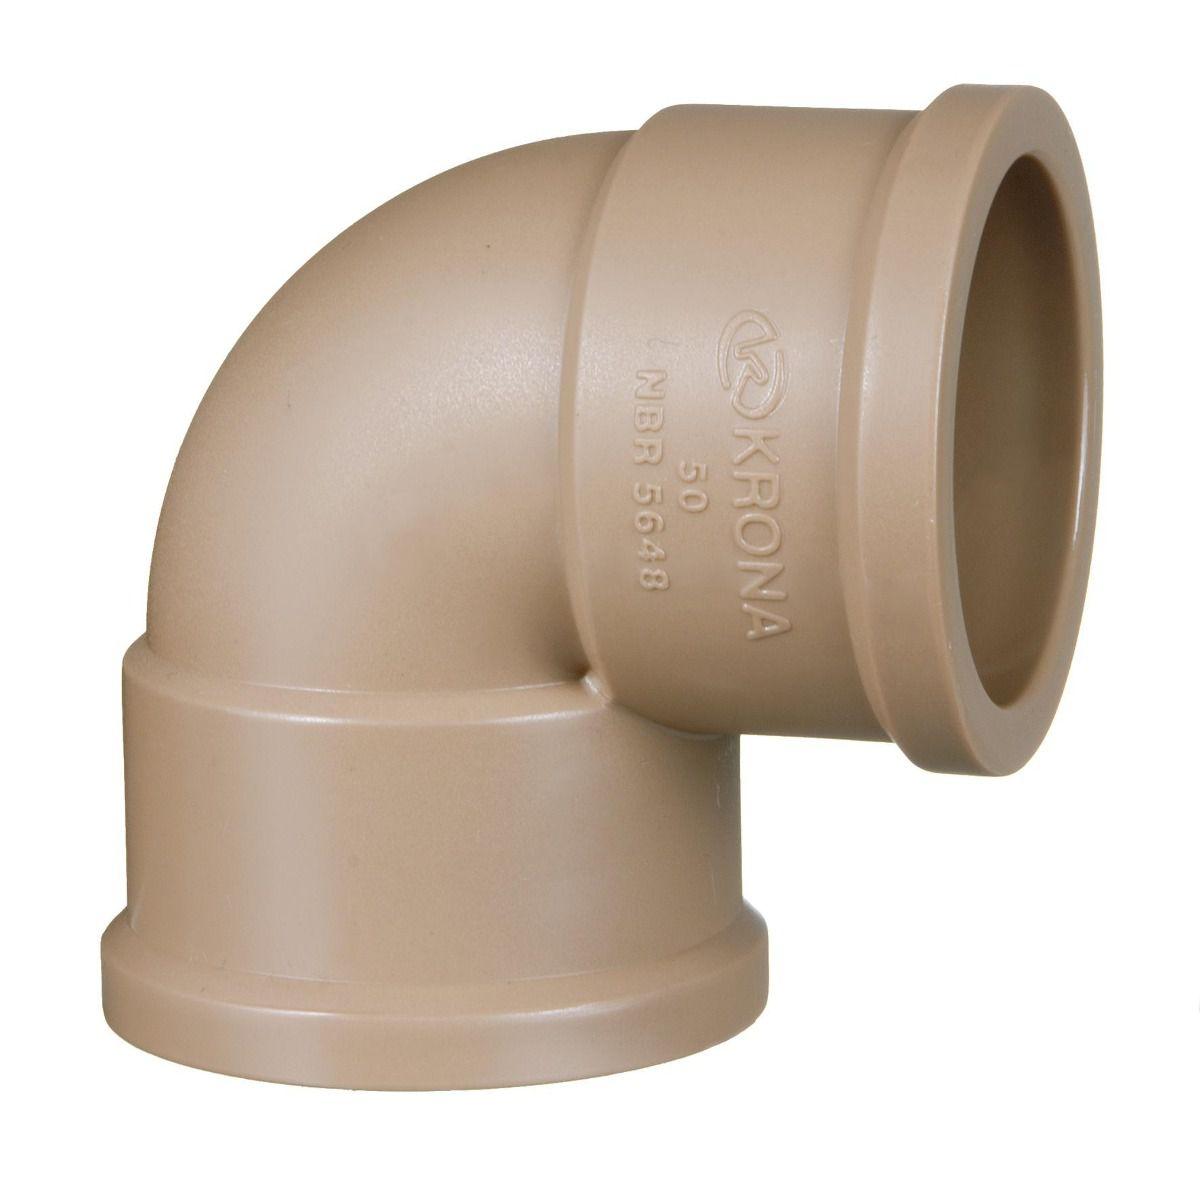 Kit 30 luvas 3/4 30 curvas 3/4 15 curvas 3/4 com rosca 1 cola de PVC